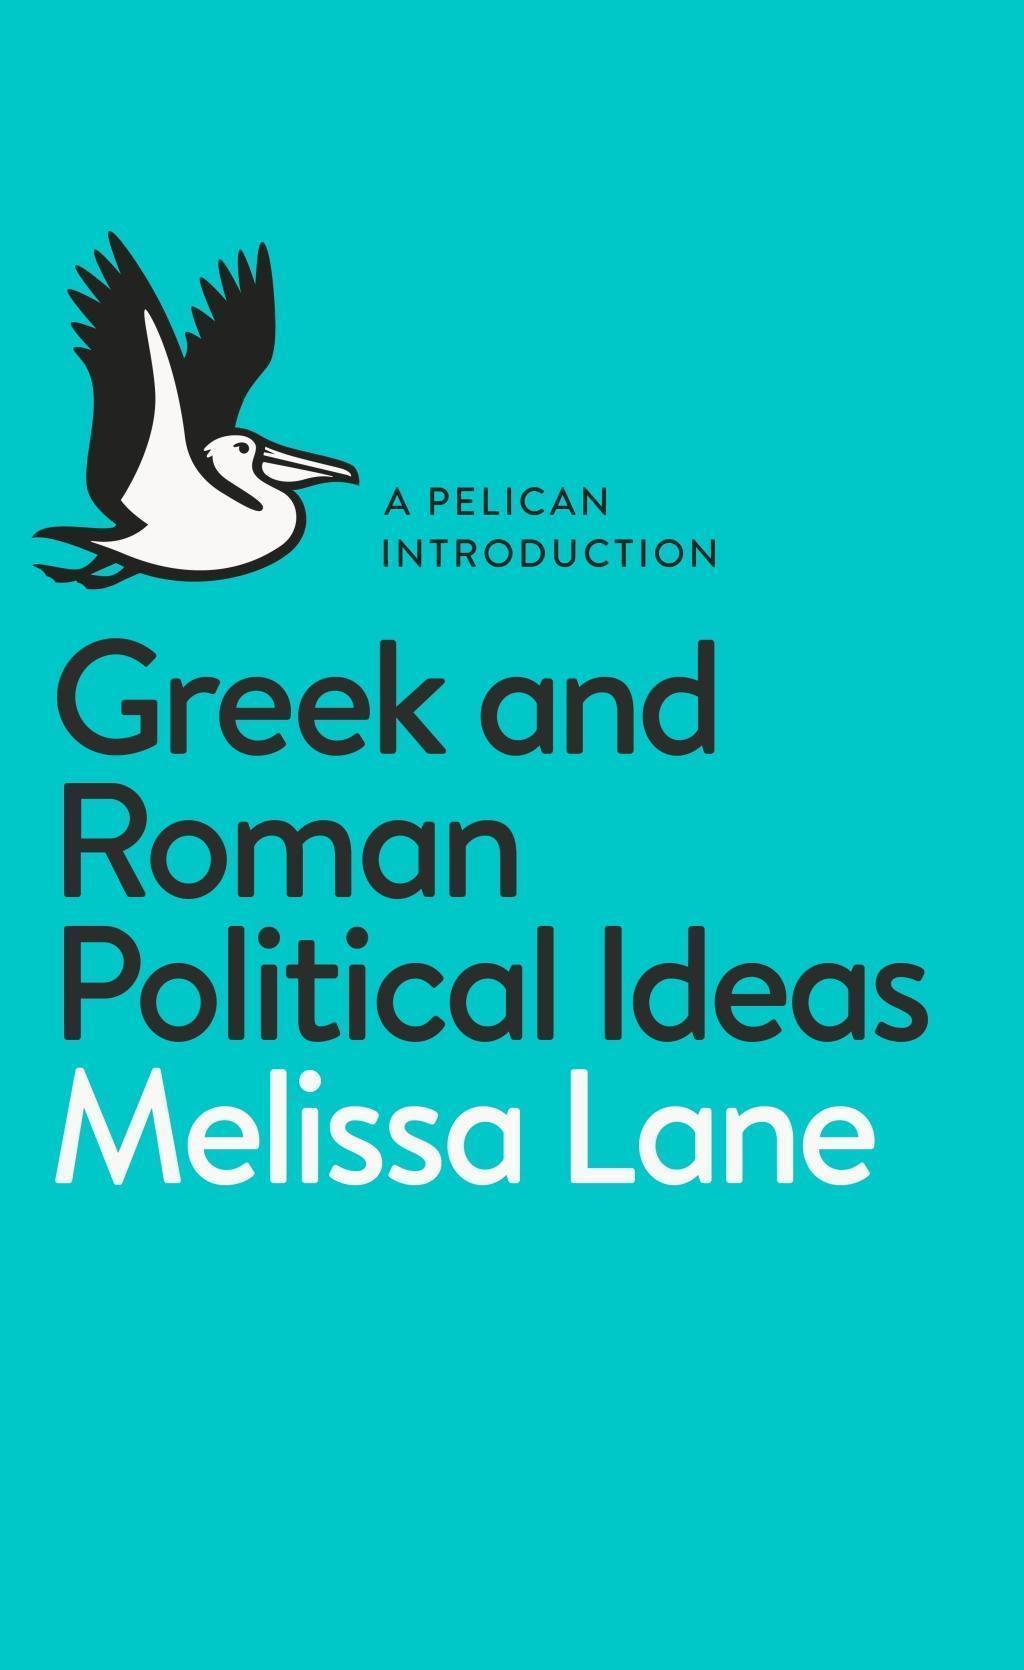 Greek and Roman Political Ideas